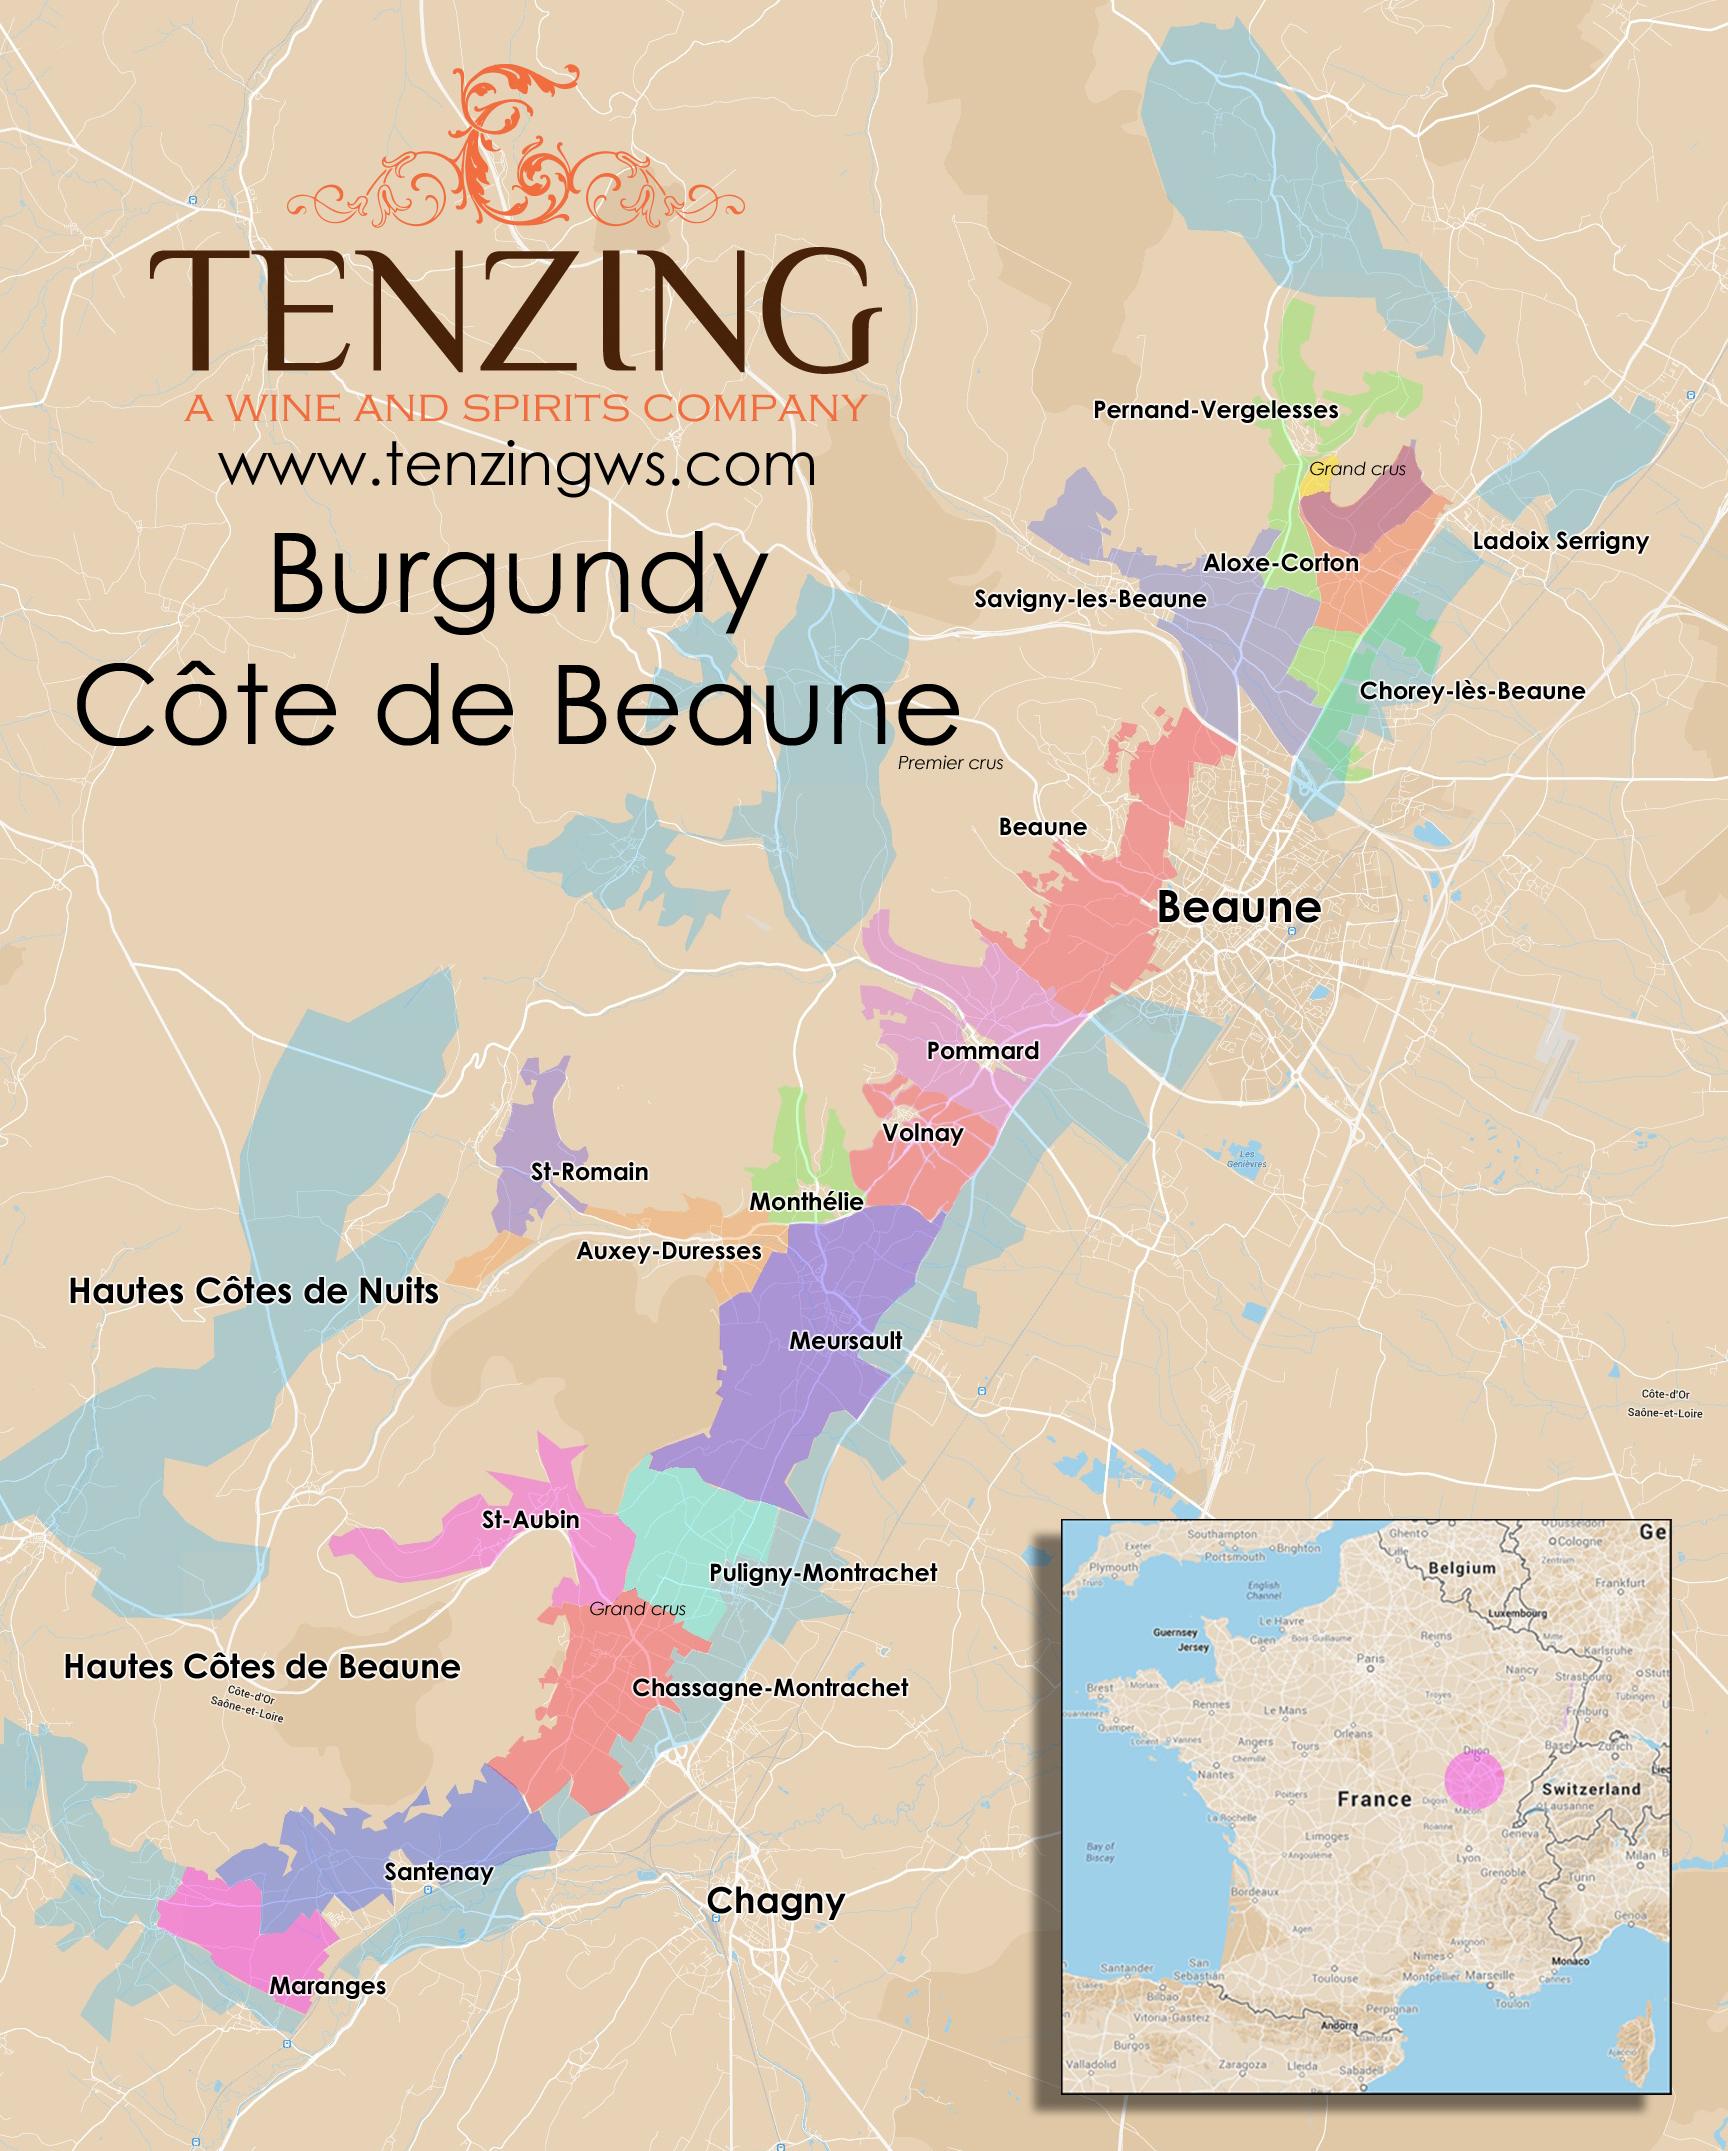 Burgundy Cote de Beaune Map